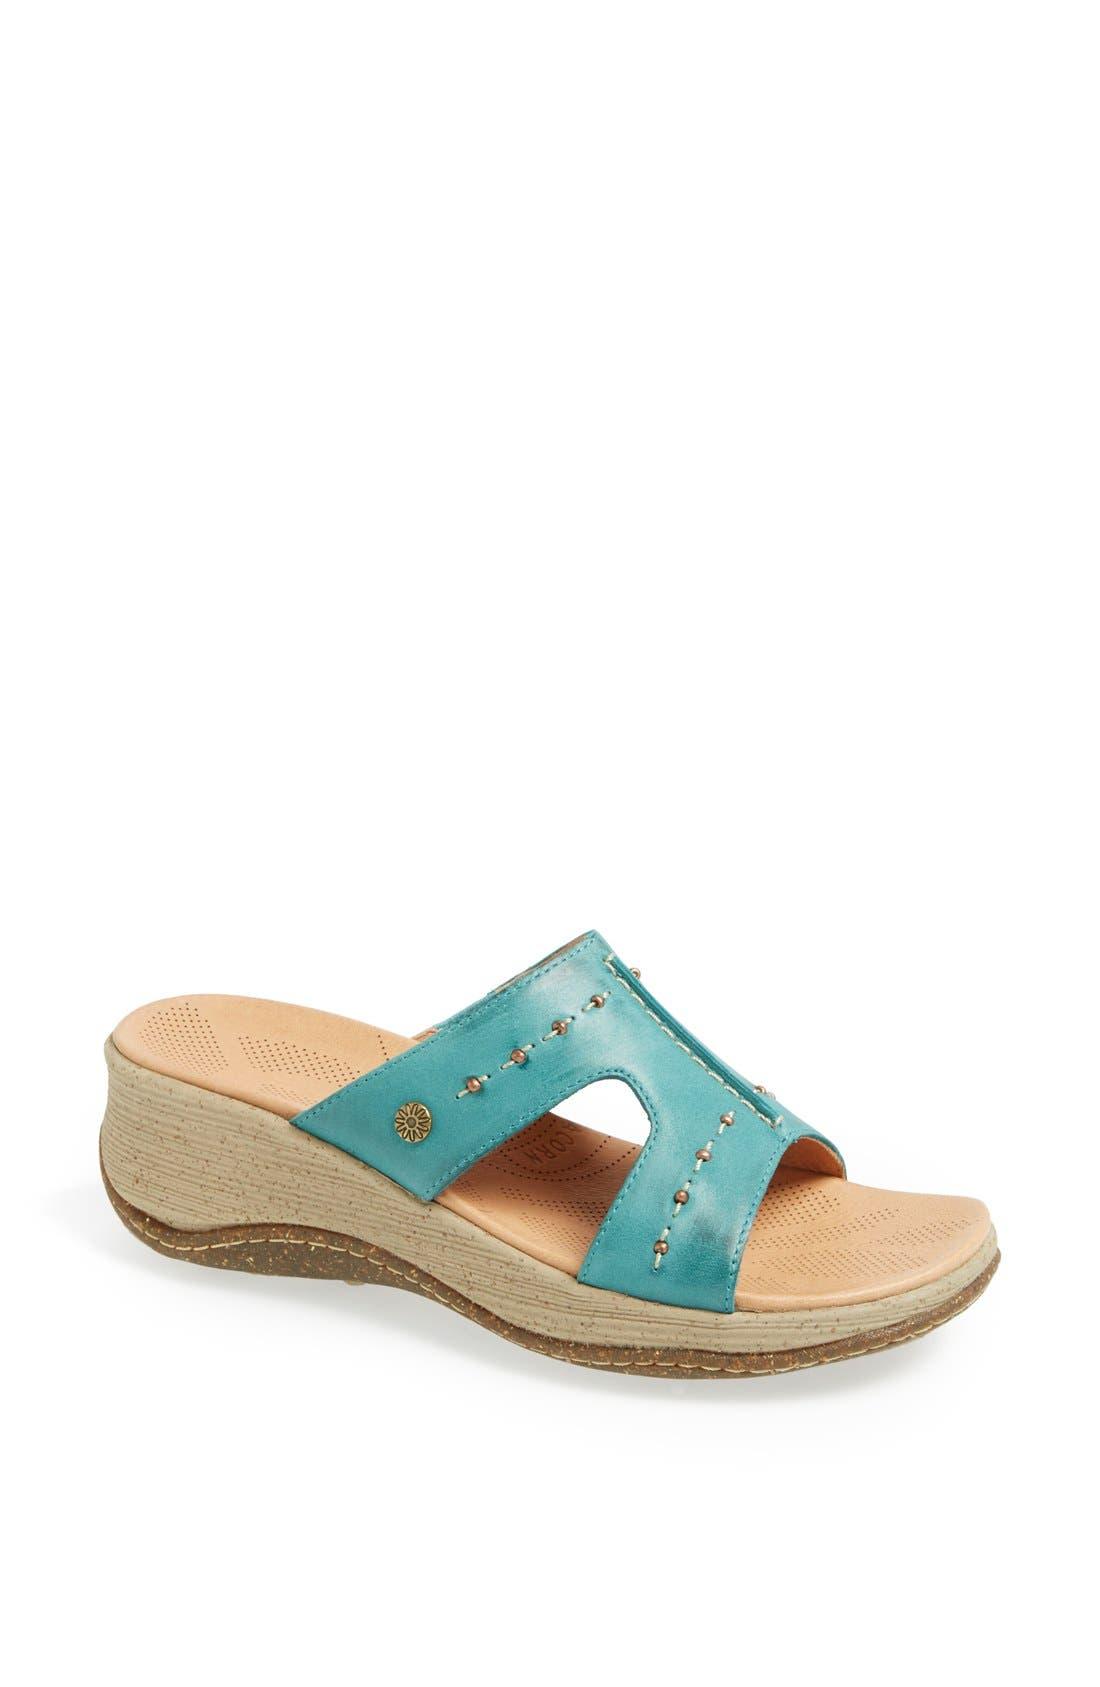 Alternate Image 1 Selected - Acorn 'Vista' Wedge Sandal